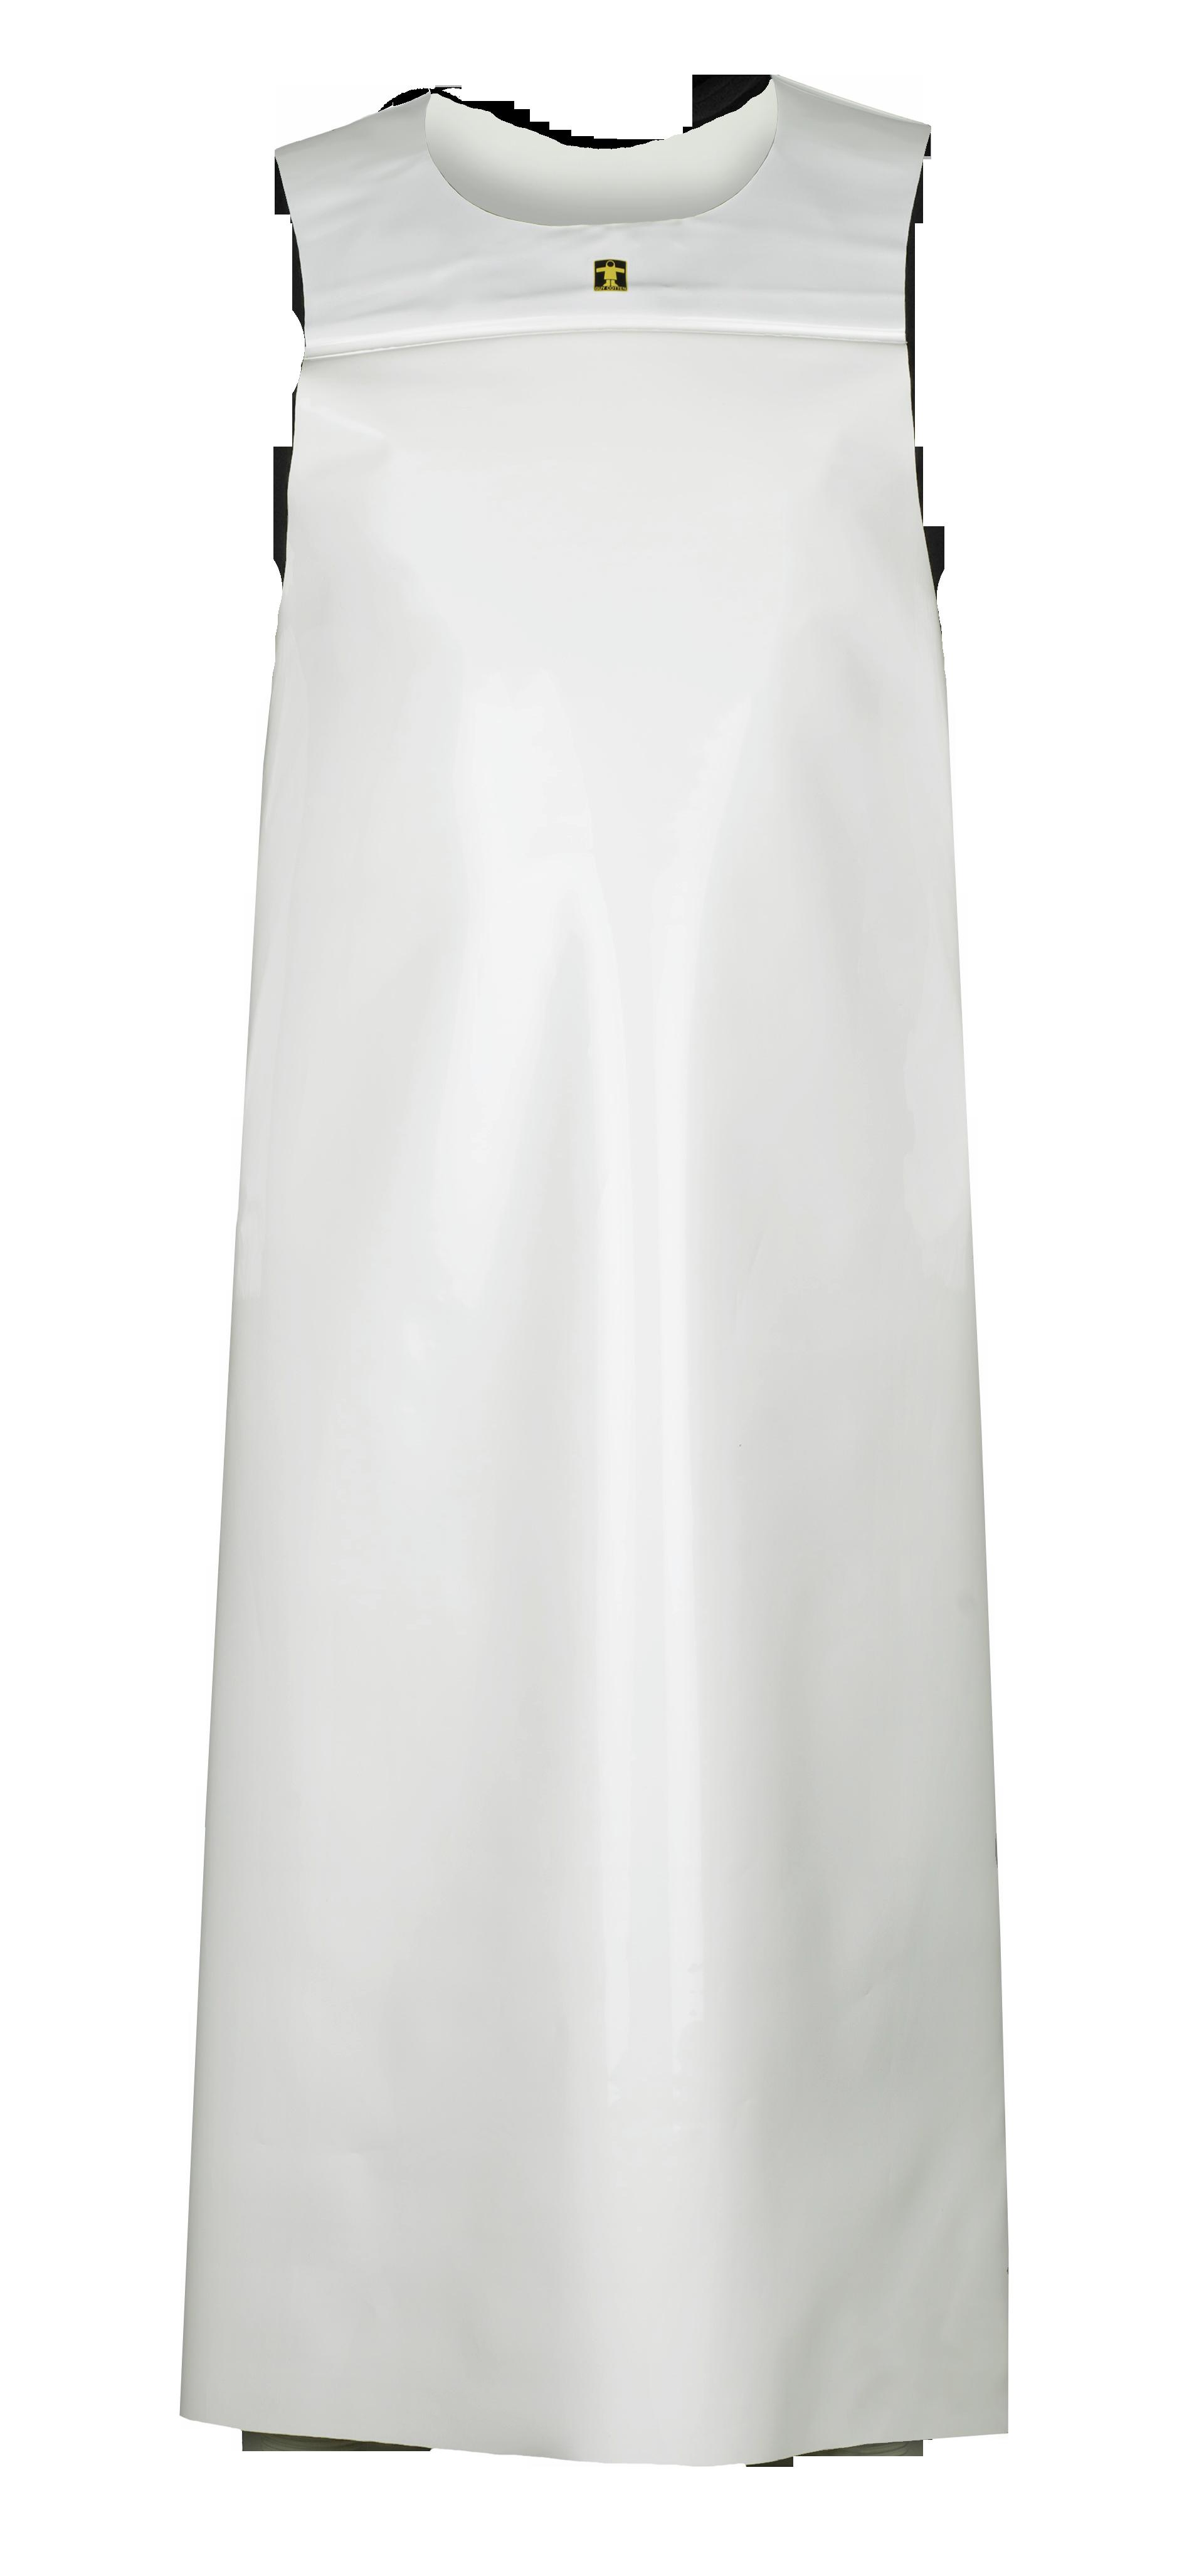 Tablier confort blanc